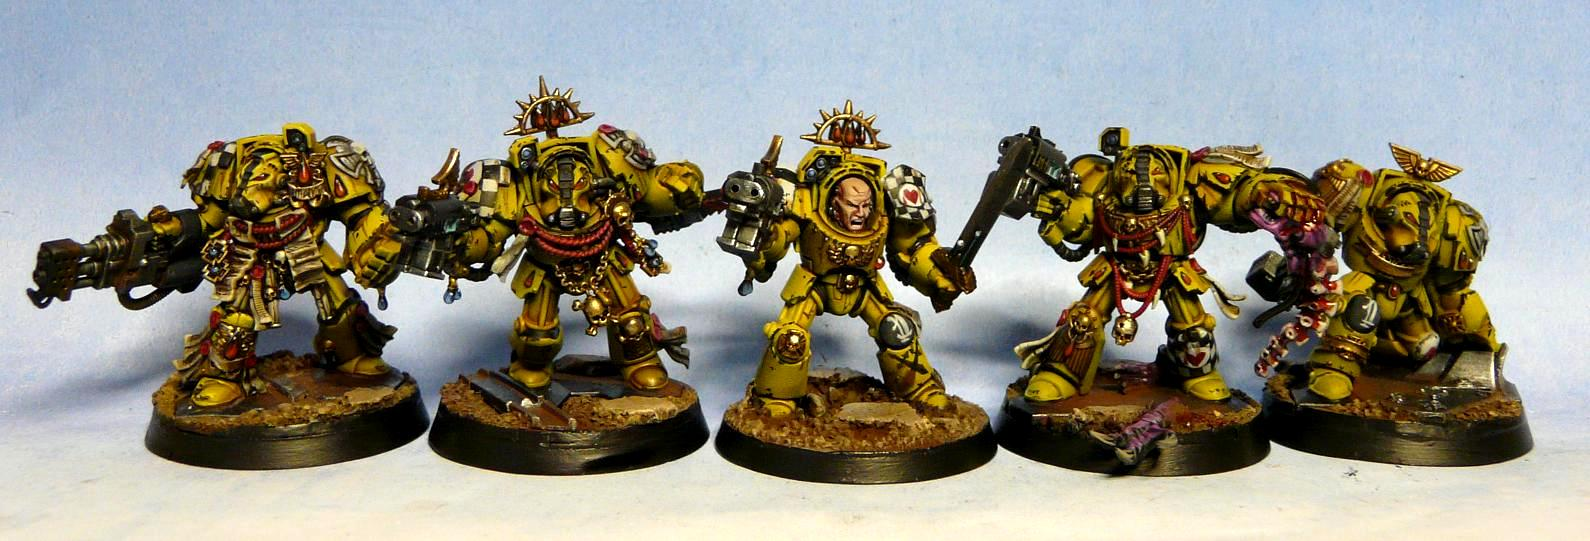 Badab War, Lamenters, Painted, Space Marines, Termies, Terminator Armor